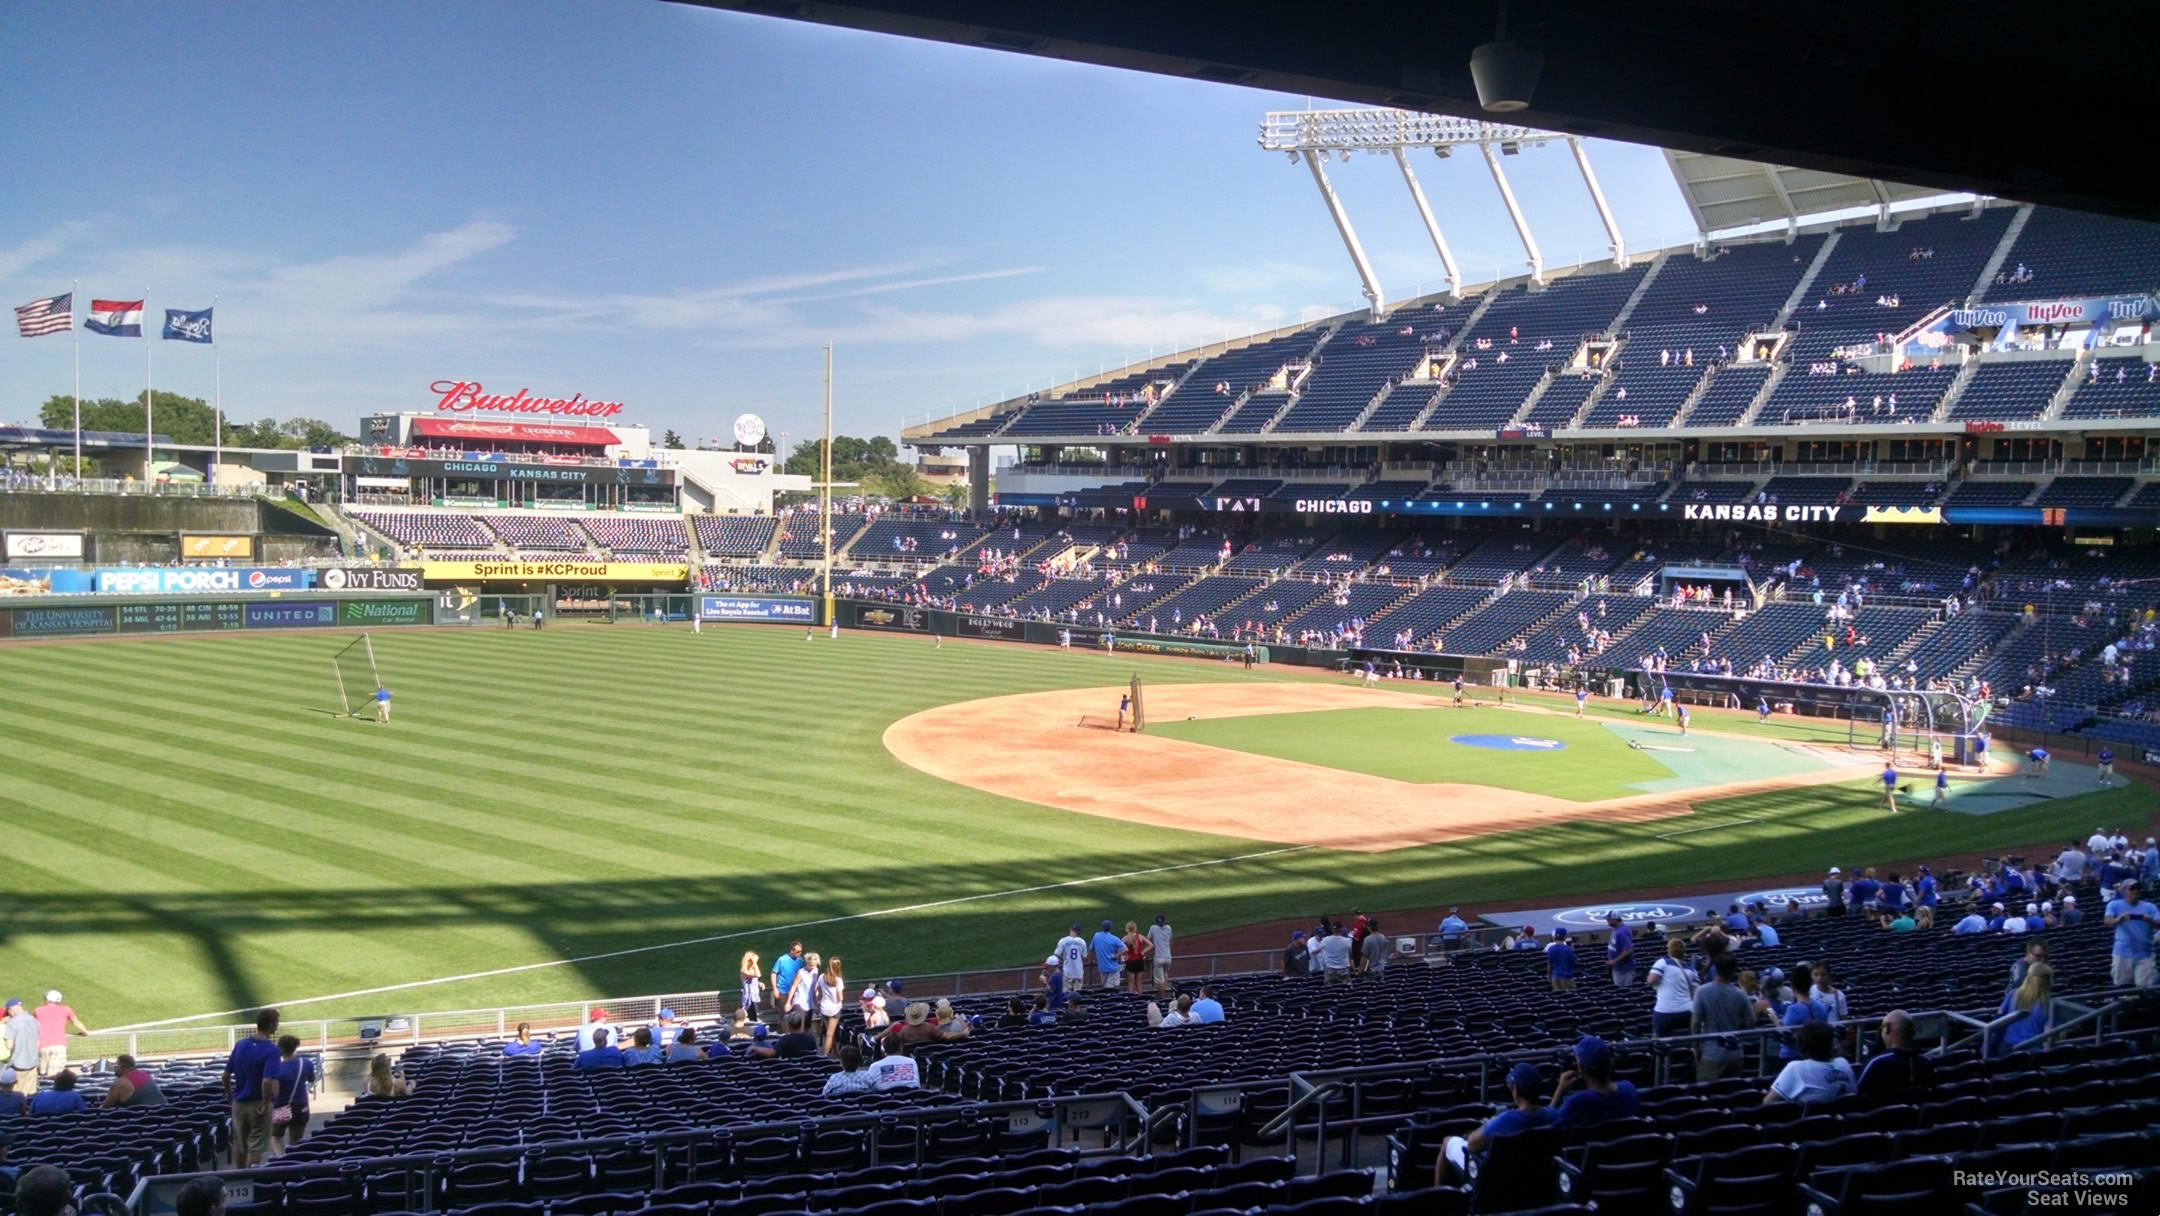 Kauffman Stadium Section 213 - RateYourSeats.com